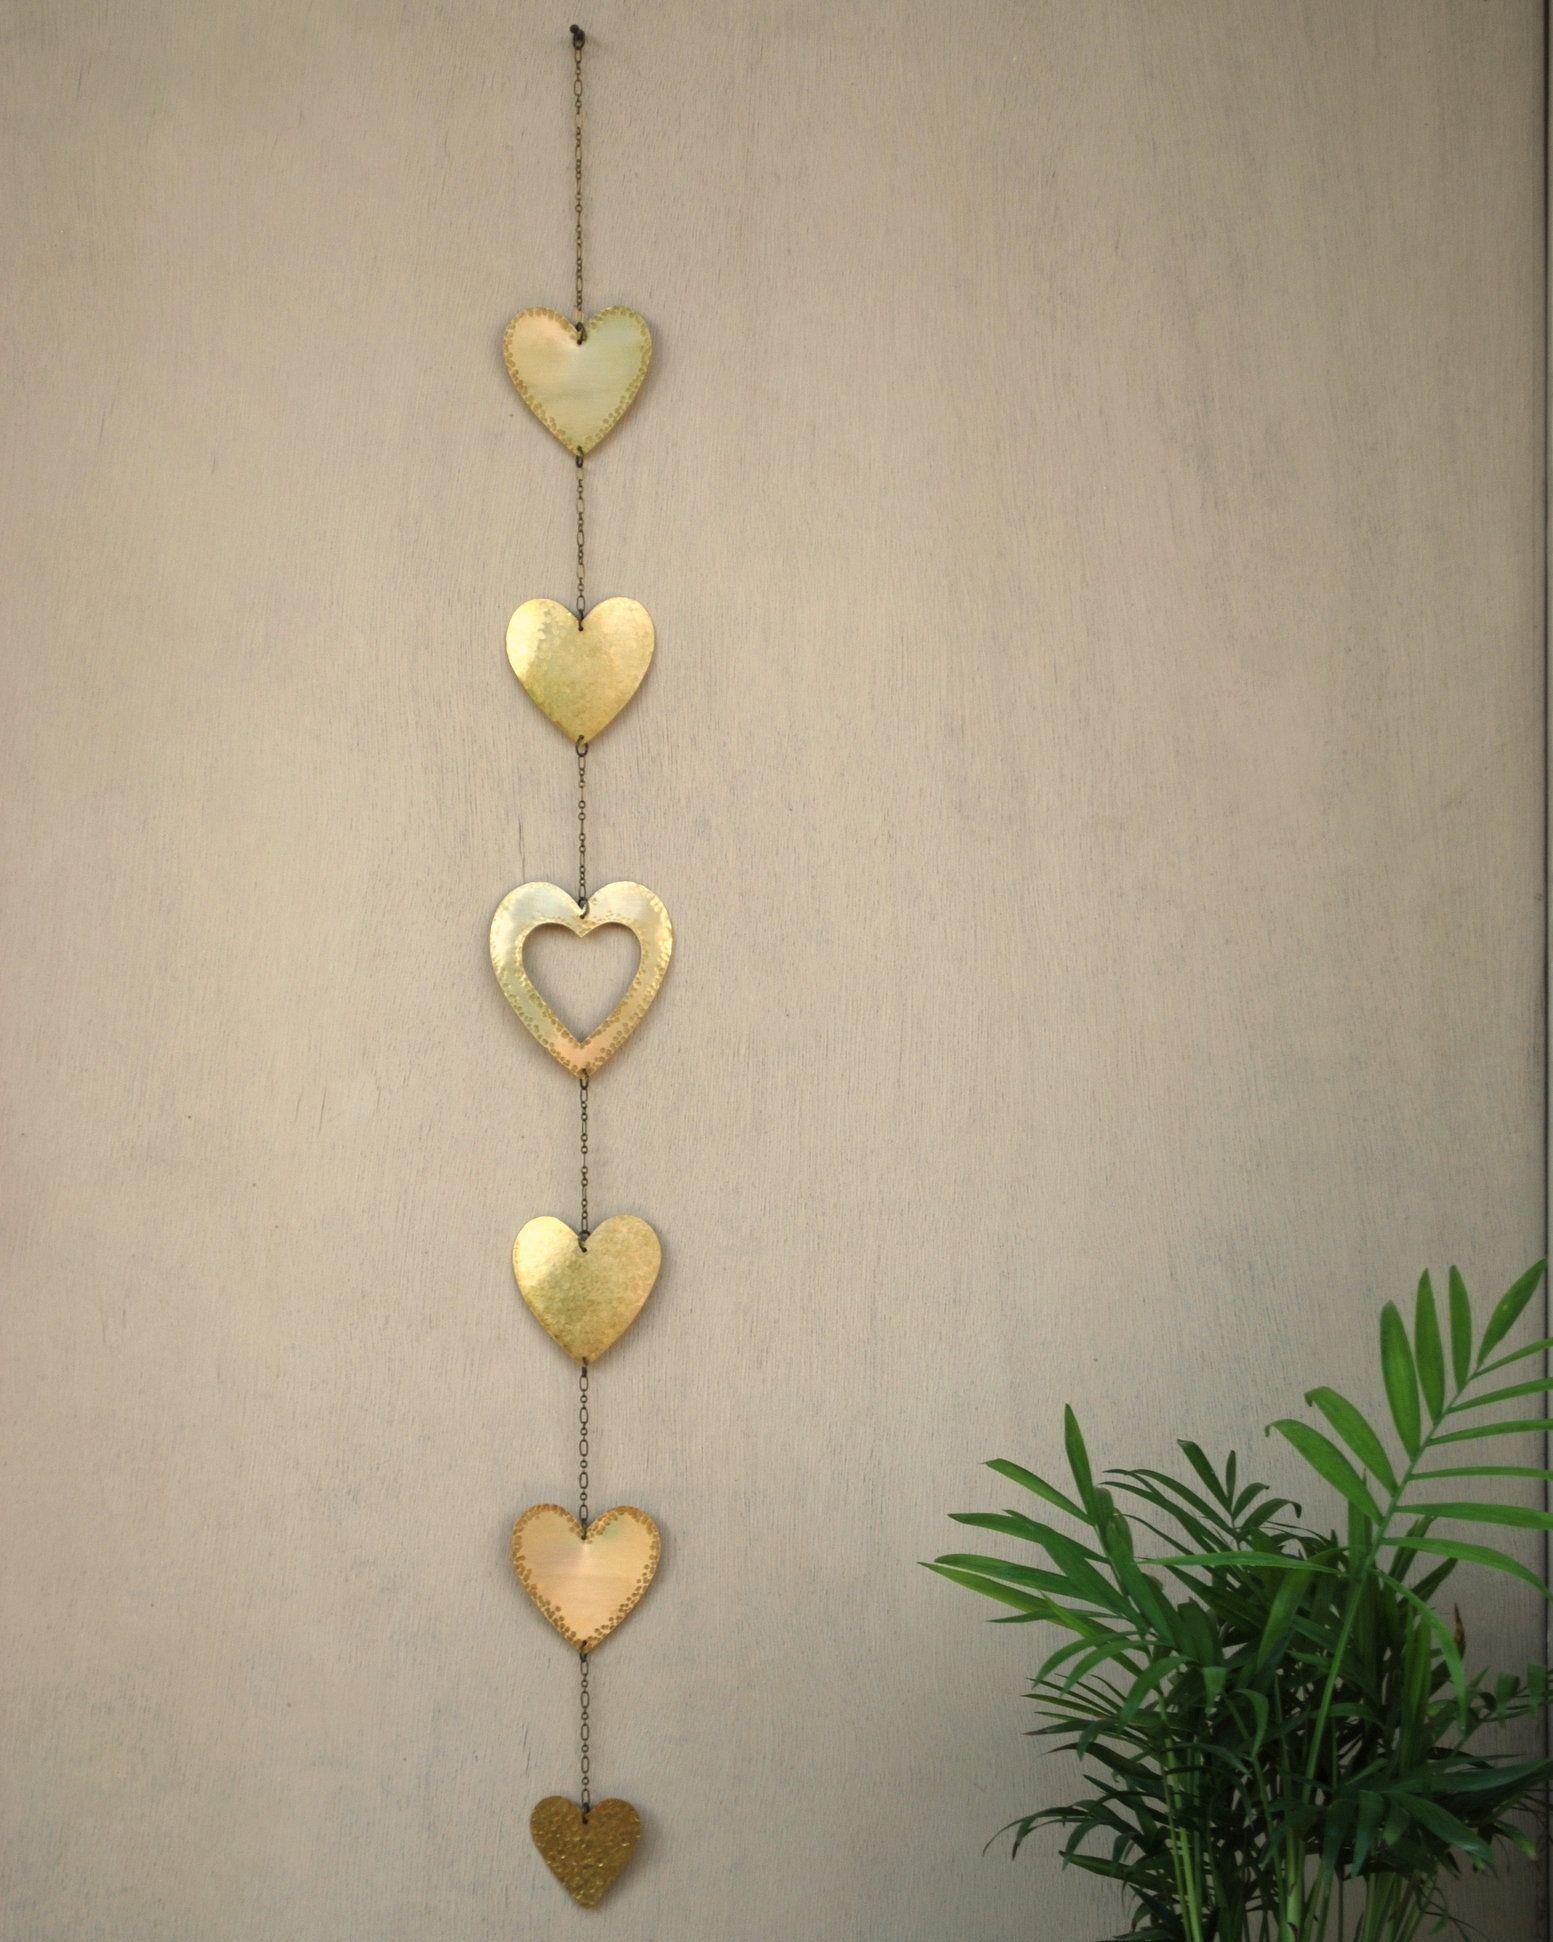 Hearts Decor Wall Art Heart Wall Hanging Metal Love Decor Etsy Heart Decorations Heart Wall Heart Wall Decor